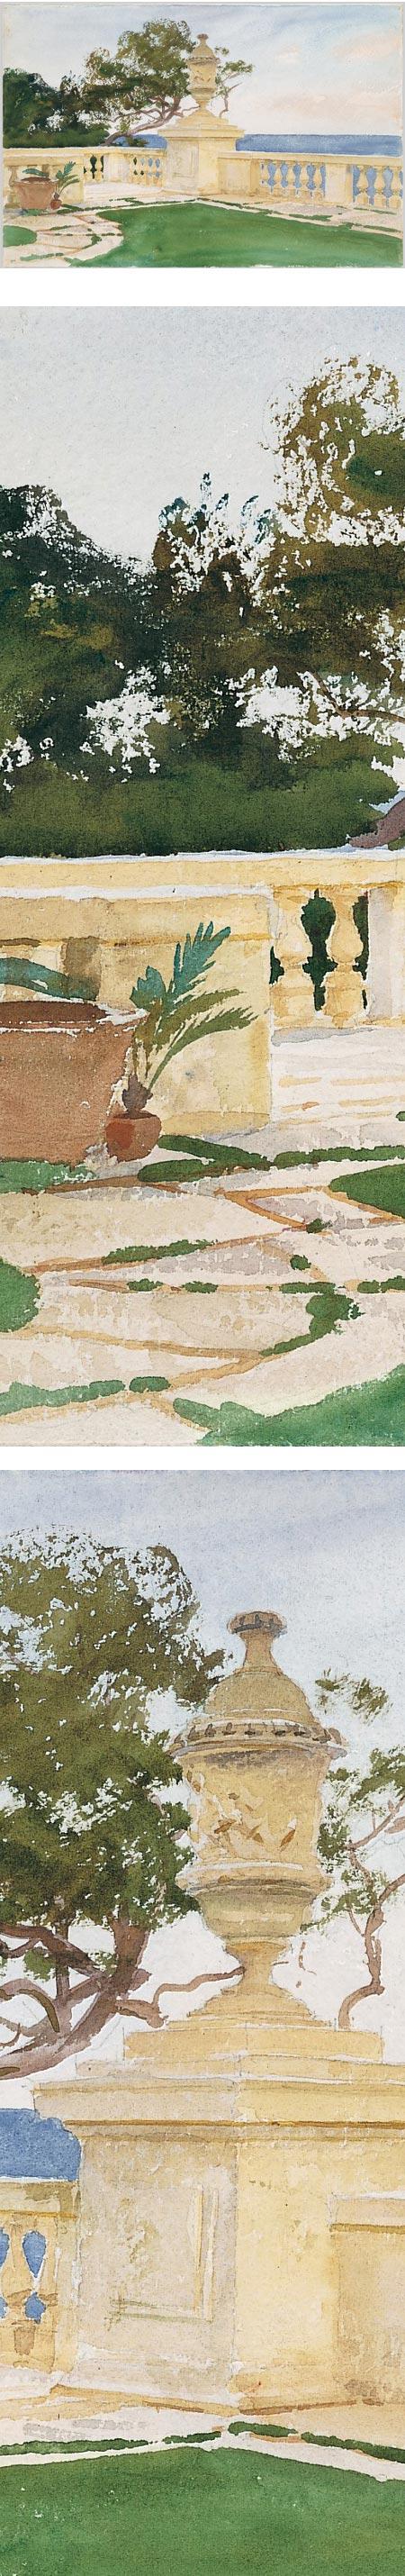 Terrace, Vizcaya, John Singer Sargent